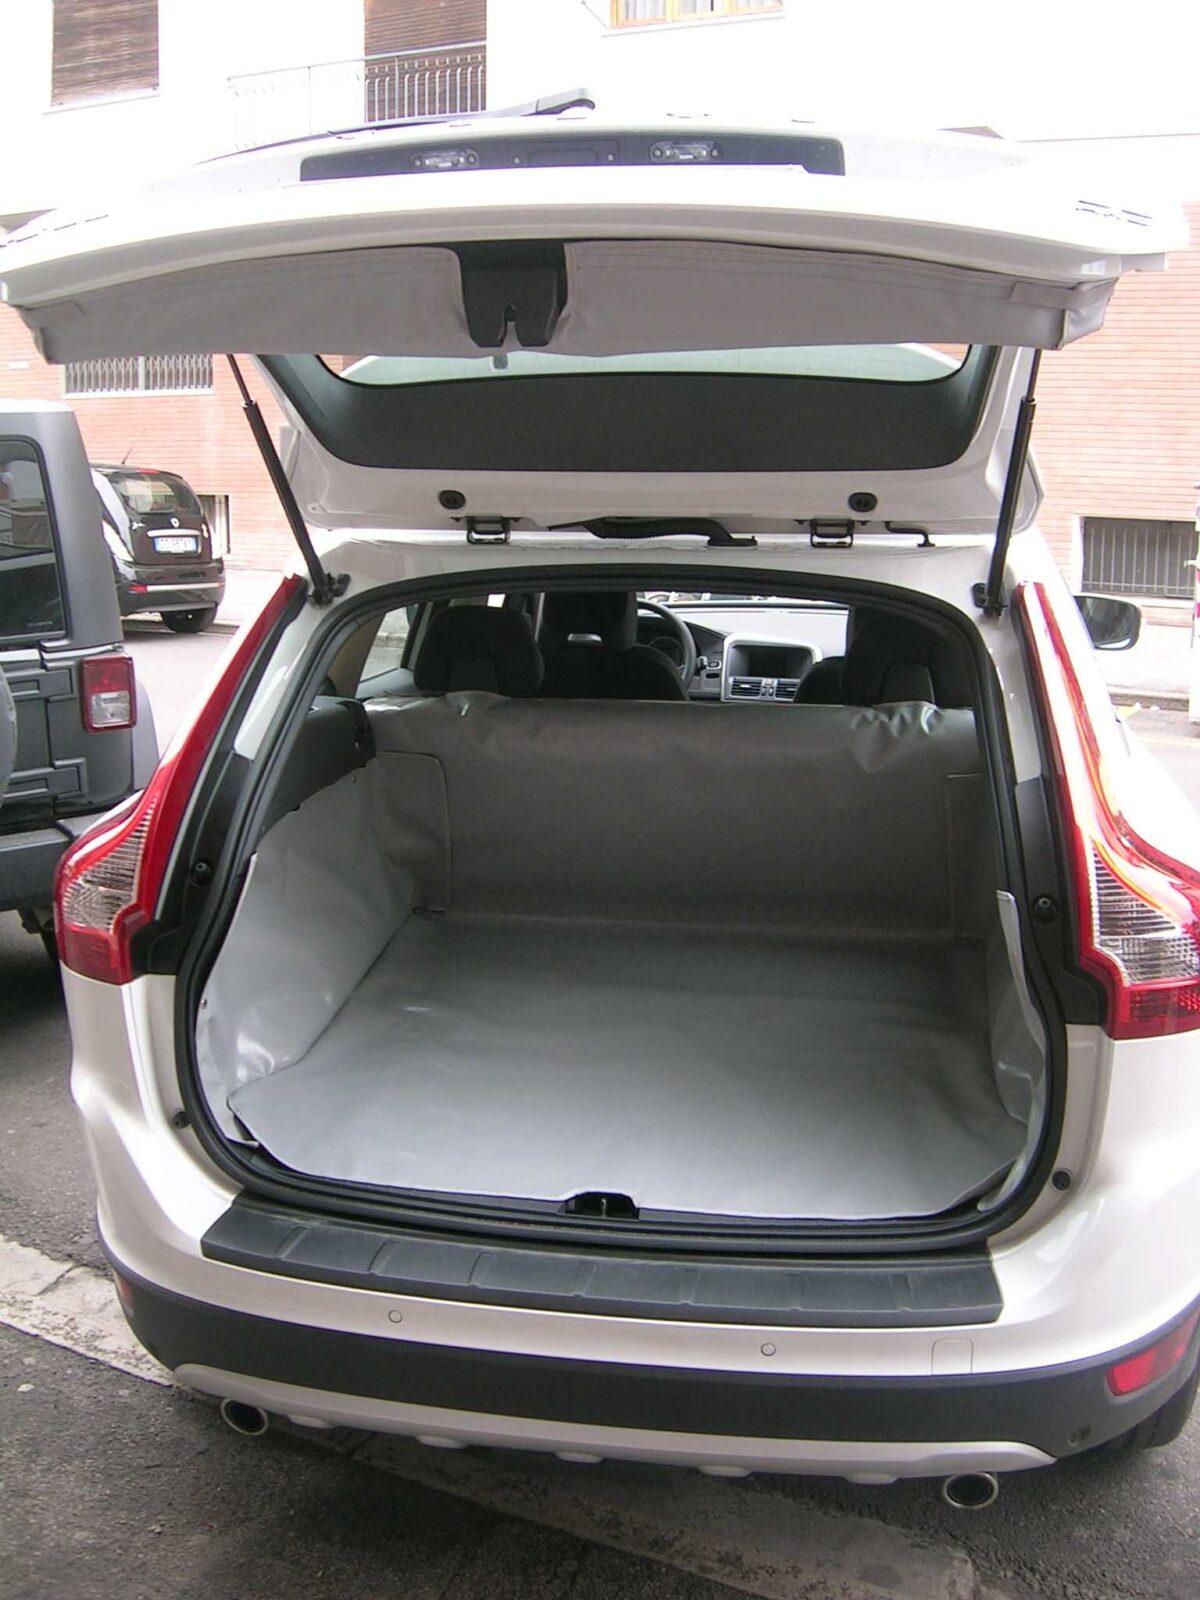 Salva-baule-Volvo-xc60-su-misura-telo-cane-vasca-bagagliaio